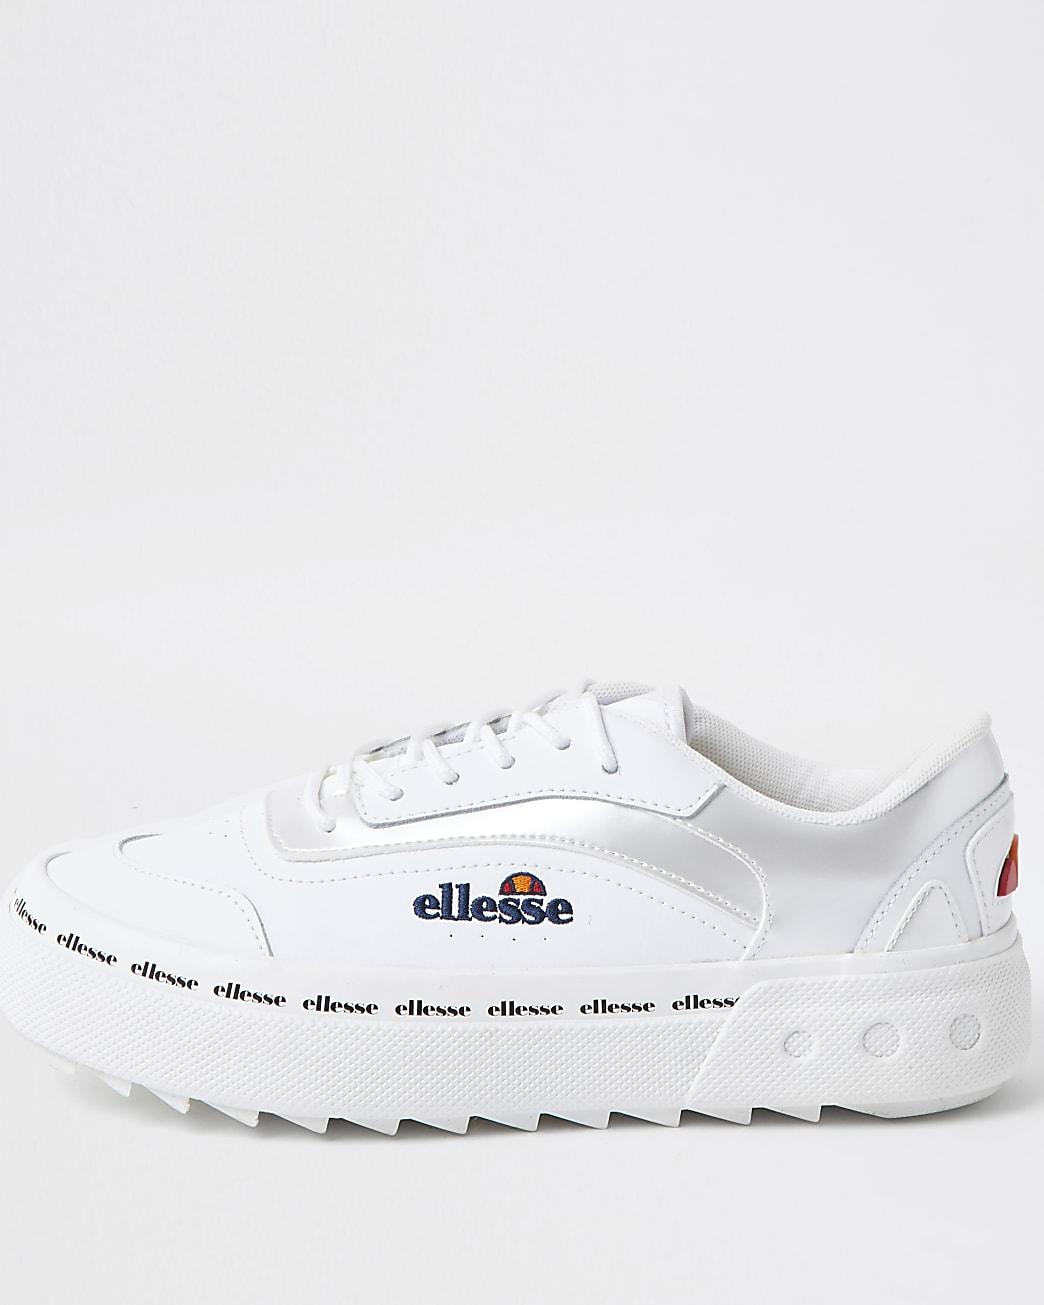 White Ellesse Alzina Lace Up Trainers